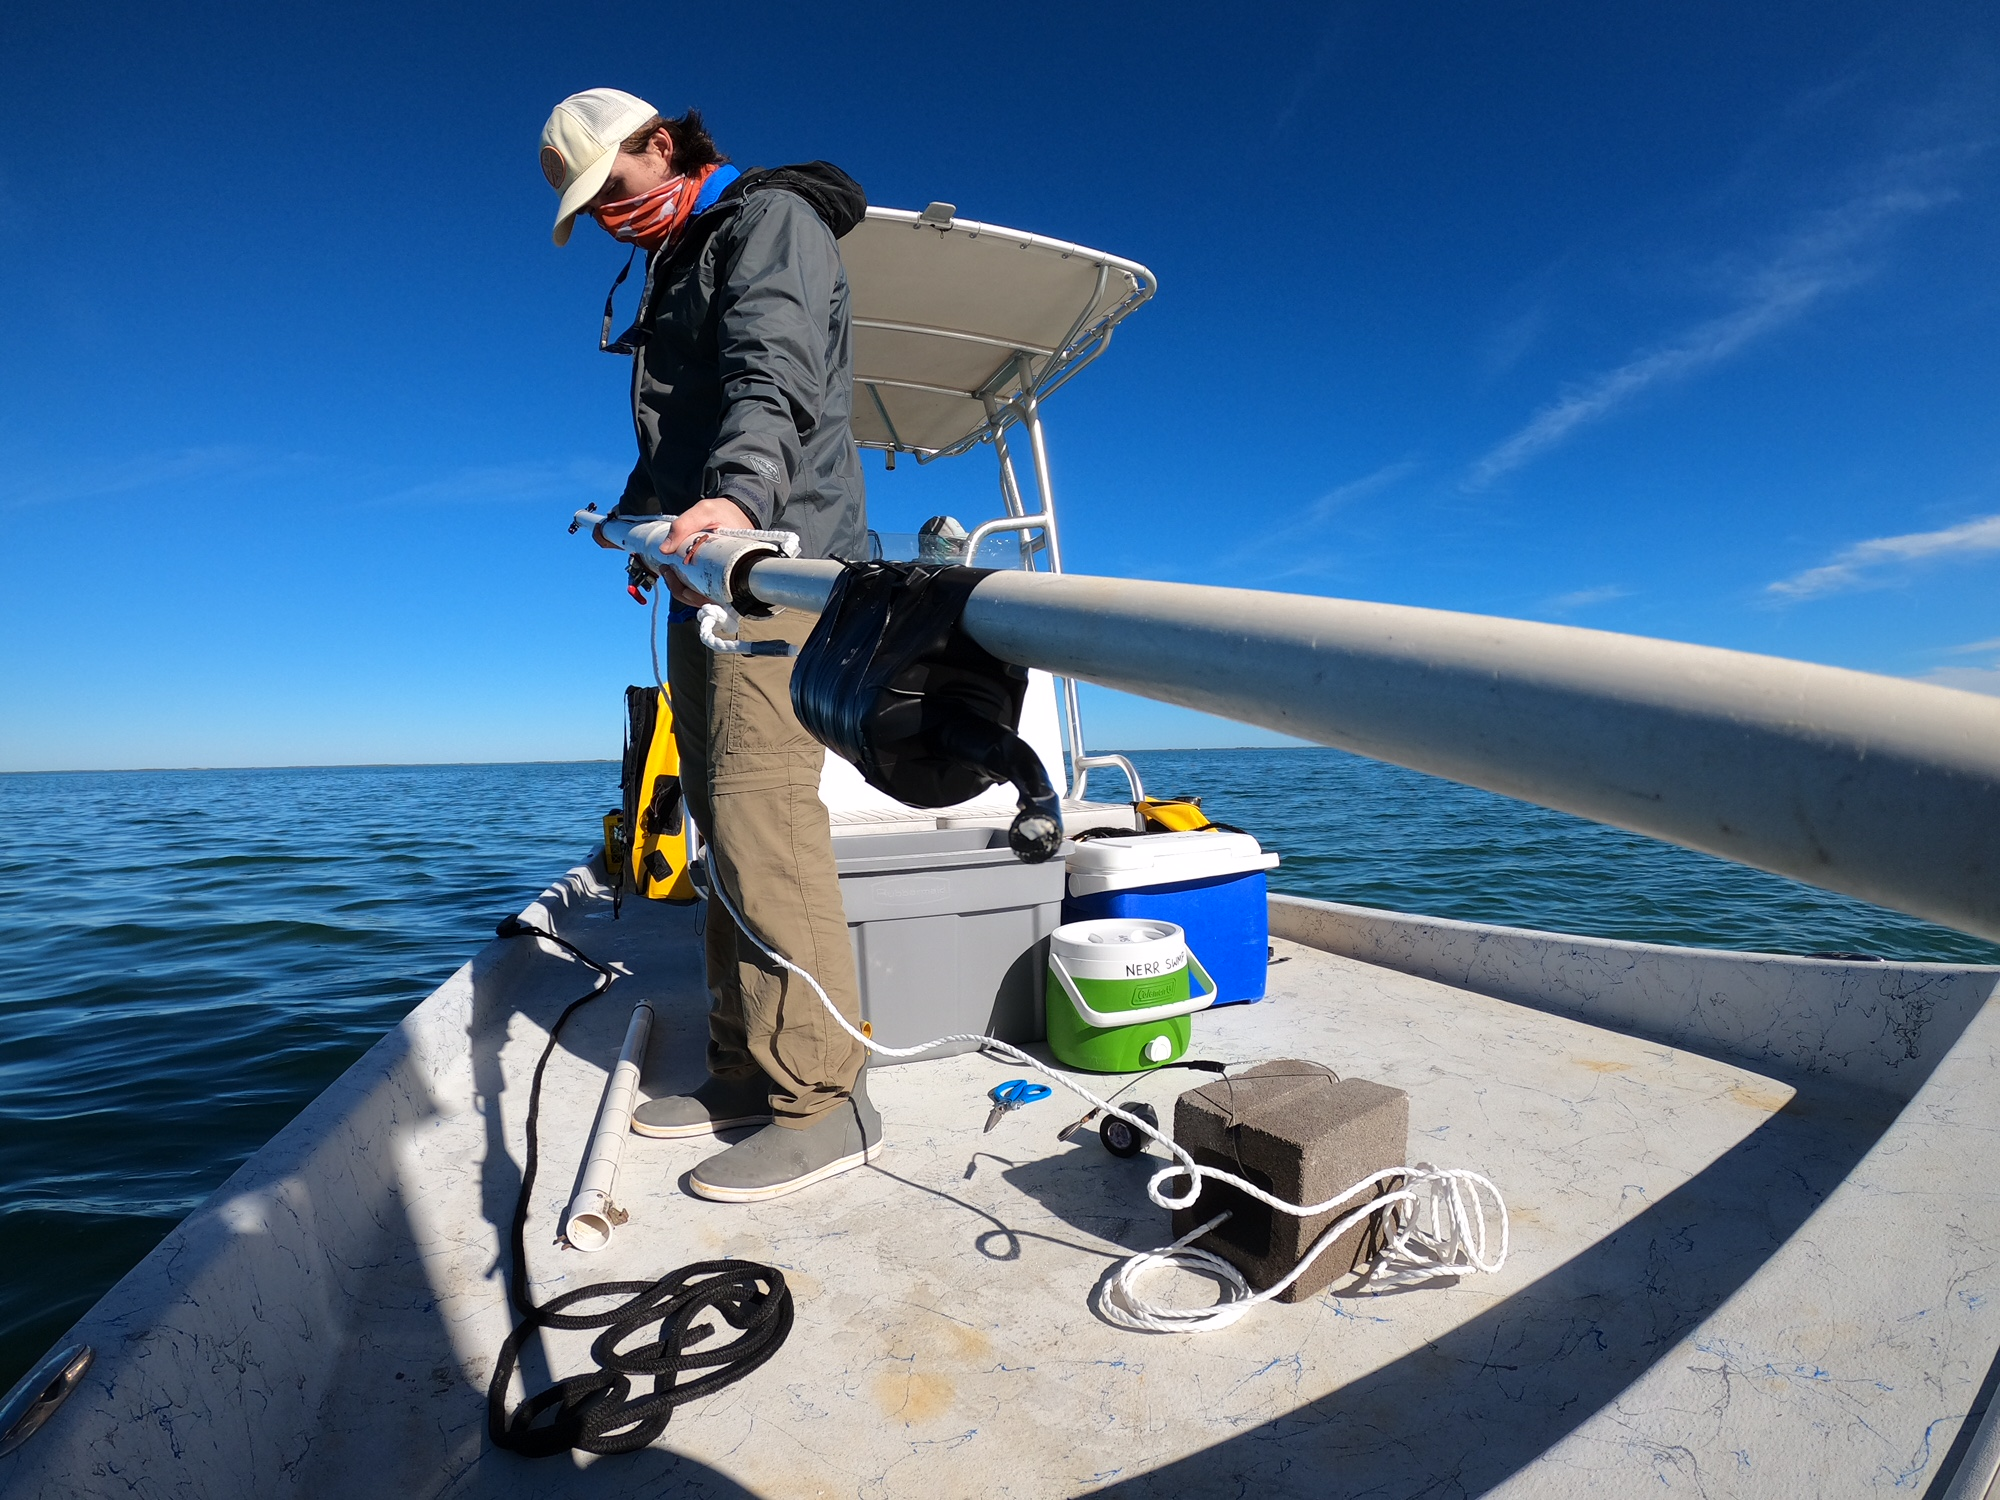 Fellow assembling equipment on a boat in the ocean.